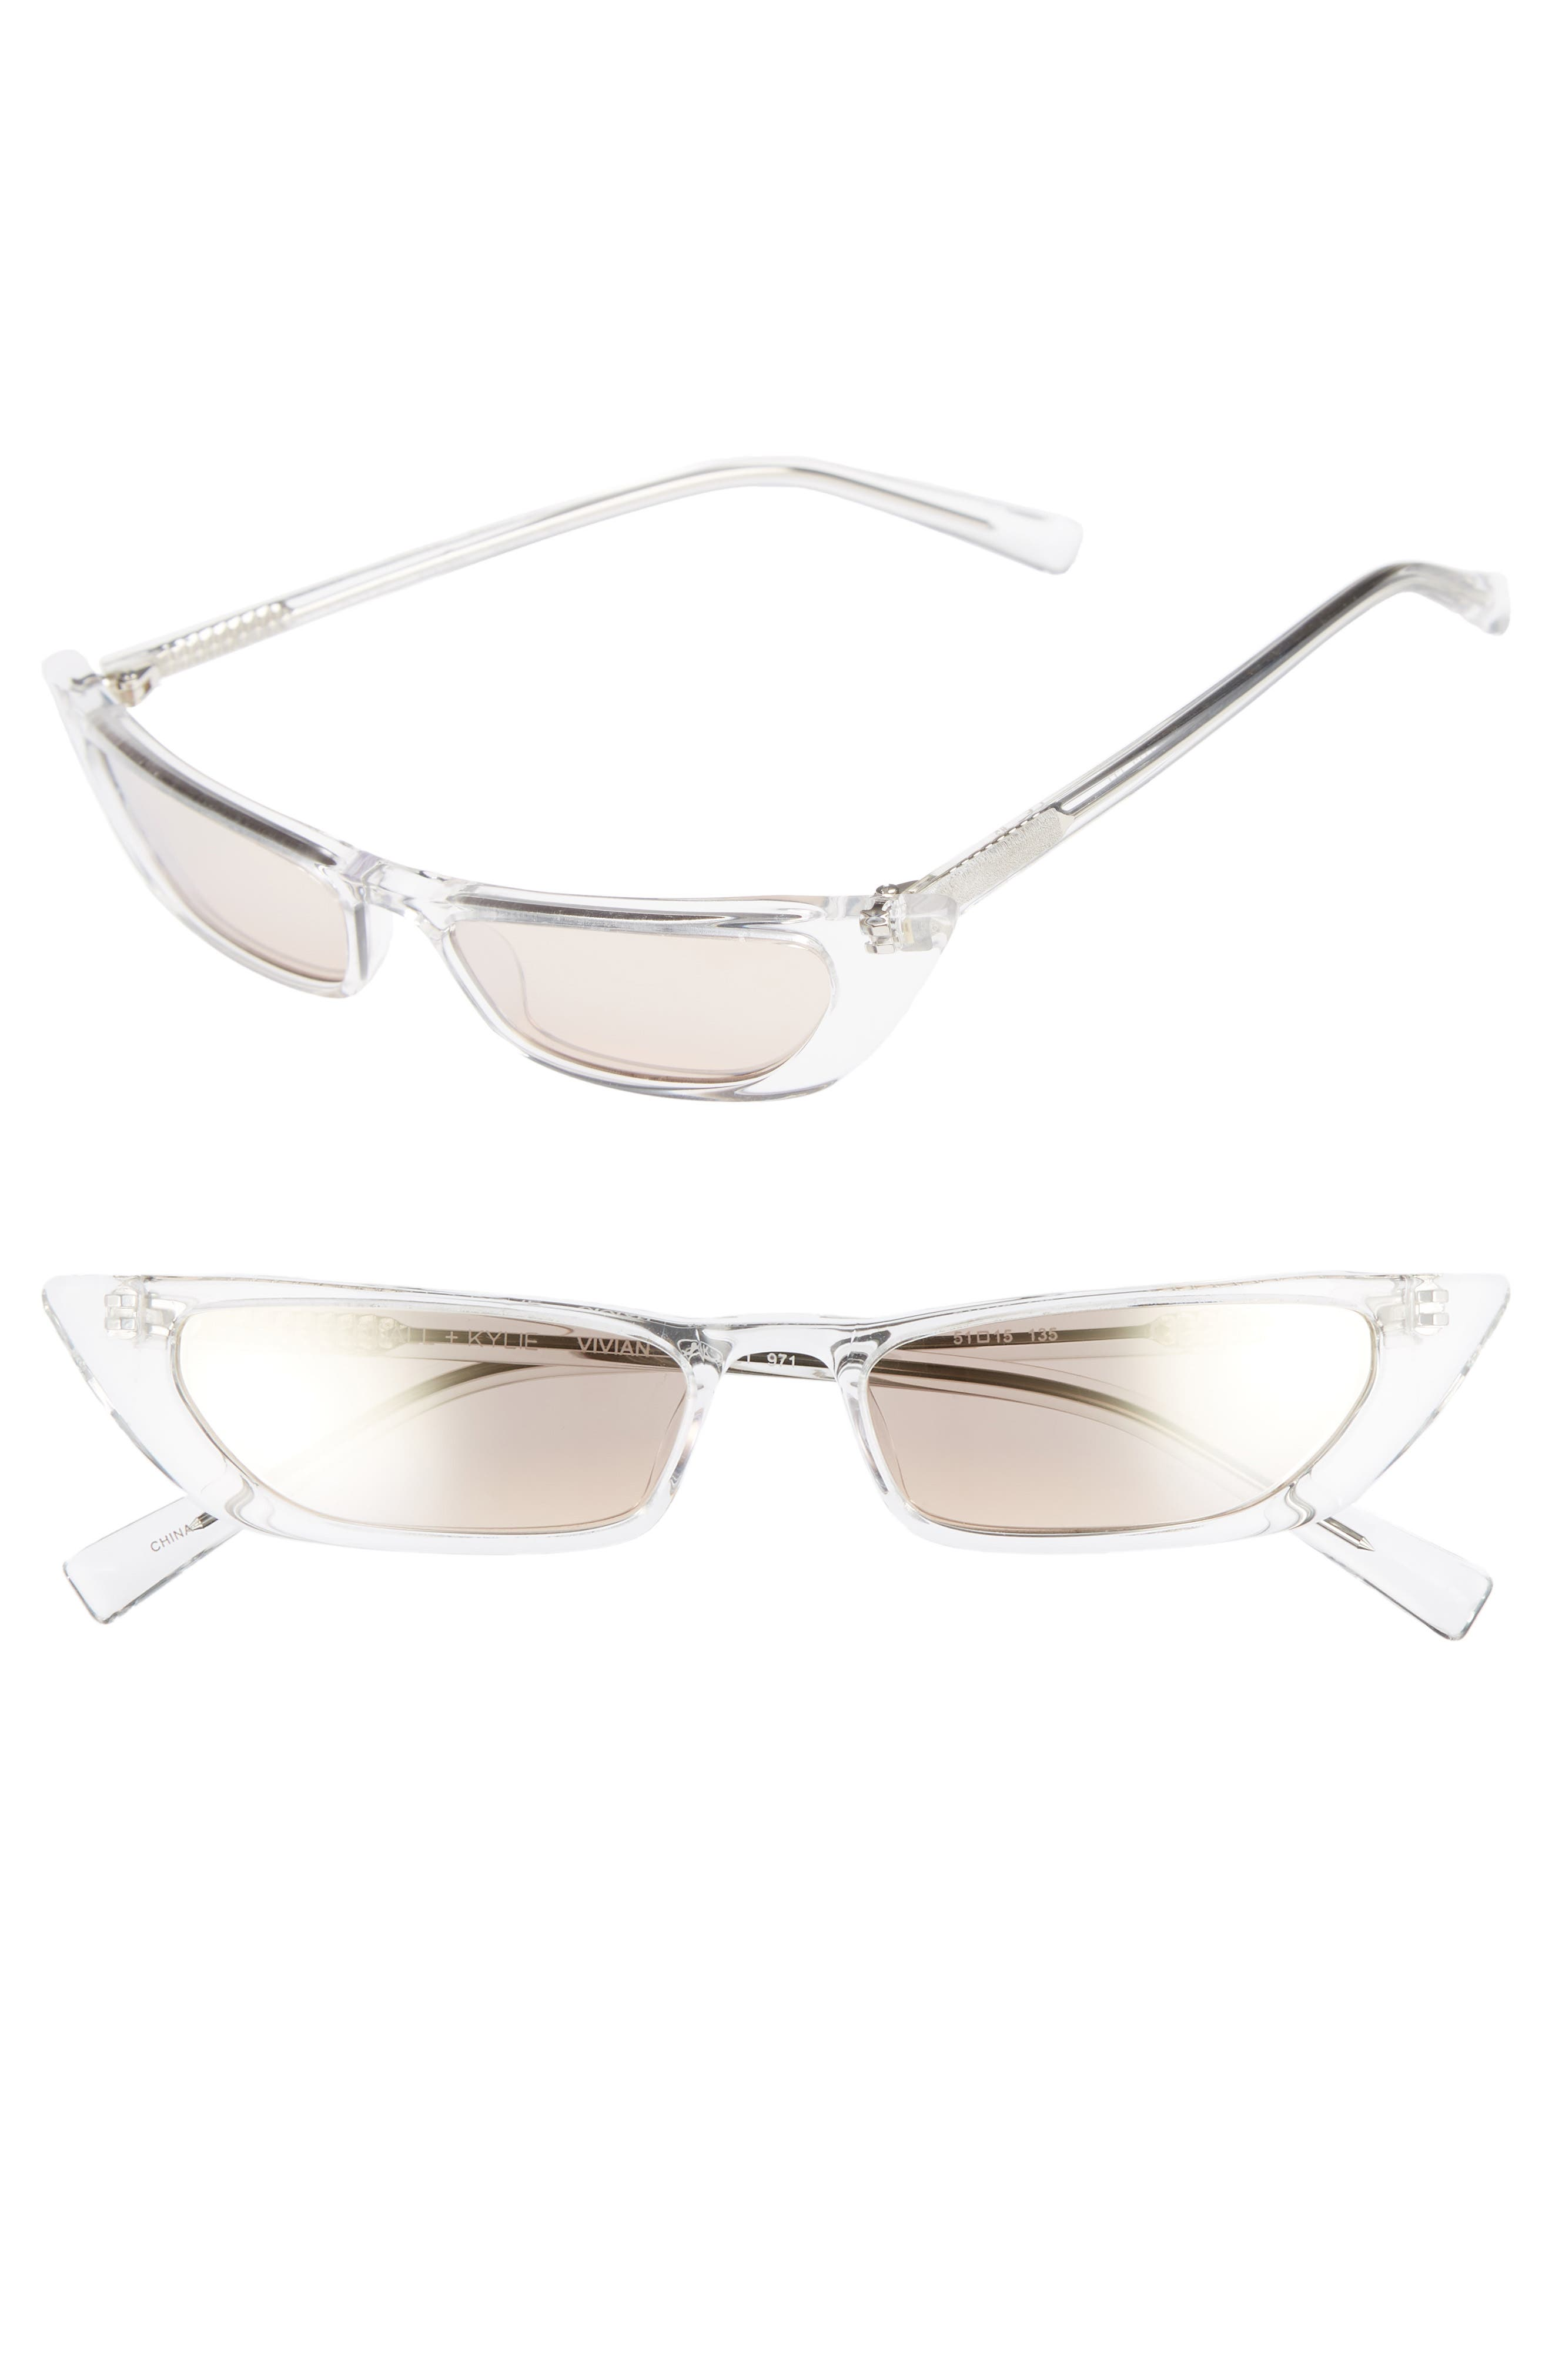 Vivian Extreme 51mm Cat Eye Sunglasses,                         Main,                         color, Crystal/ Golden Hour Gradient